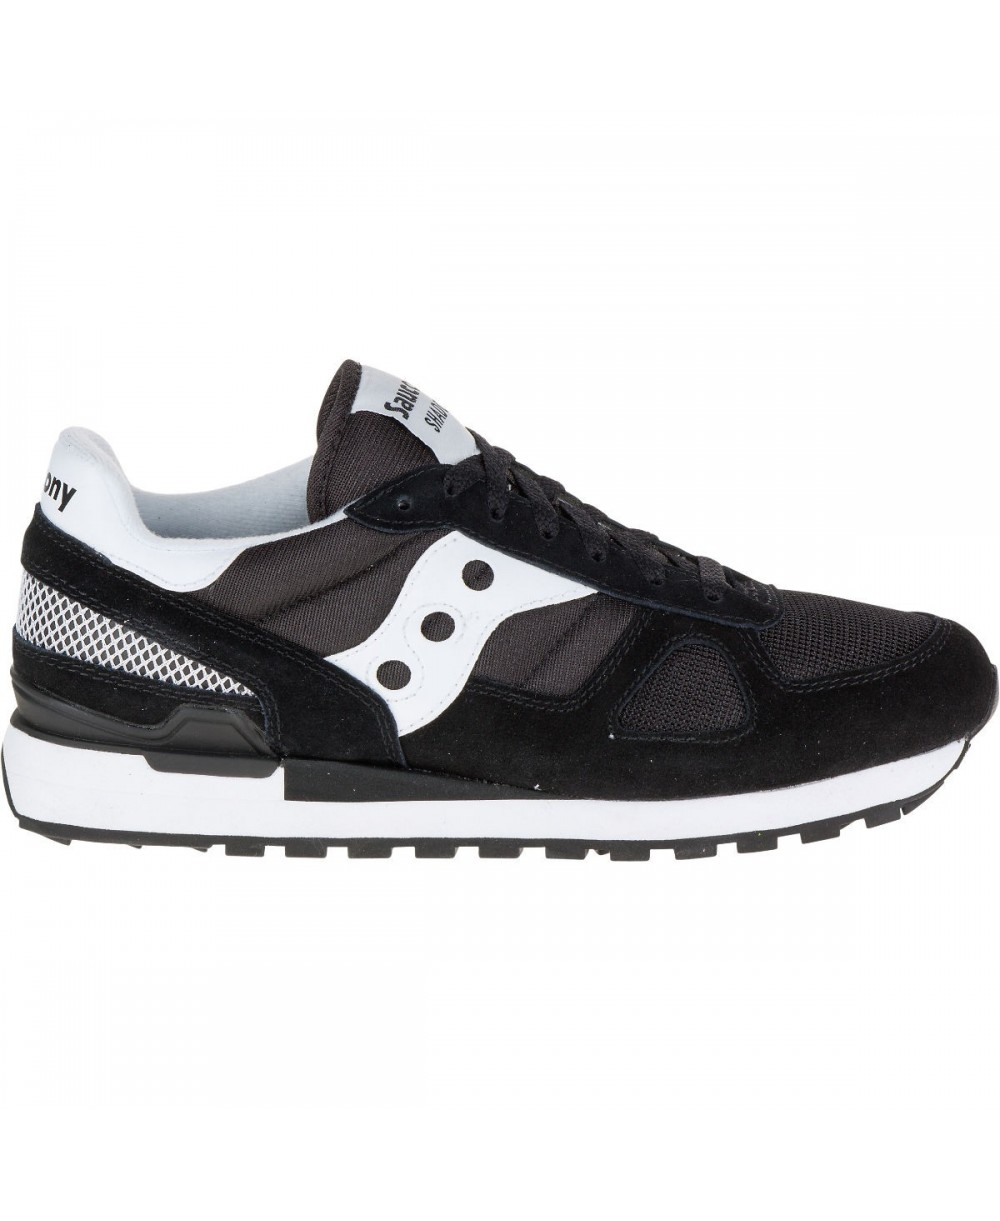 Saucony Men's adidas Originals for Sale | Shop Men's